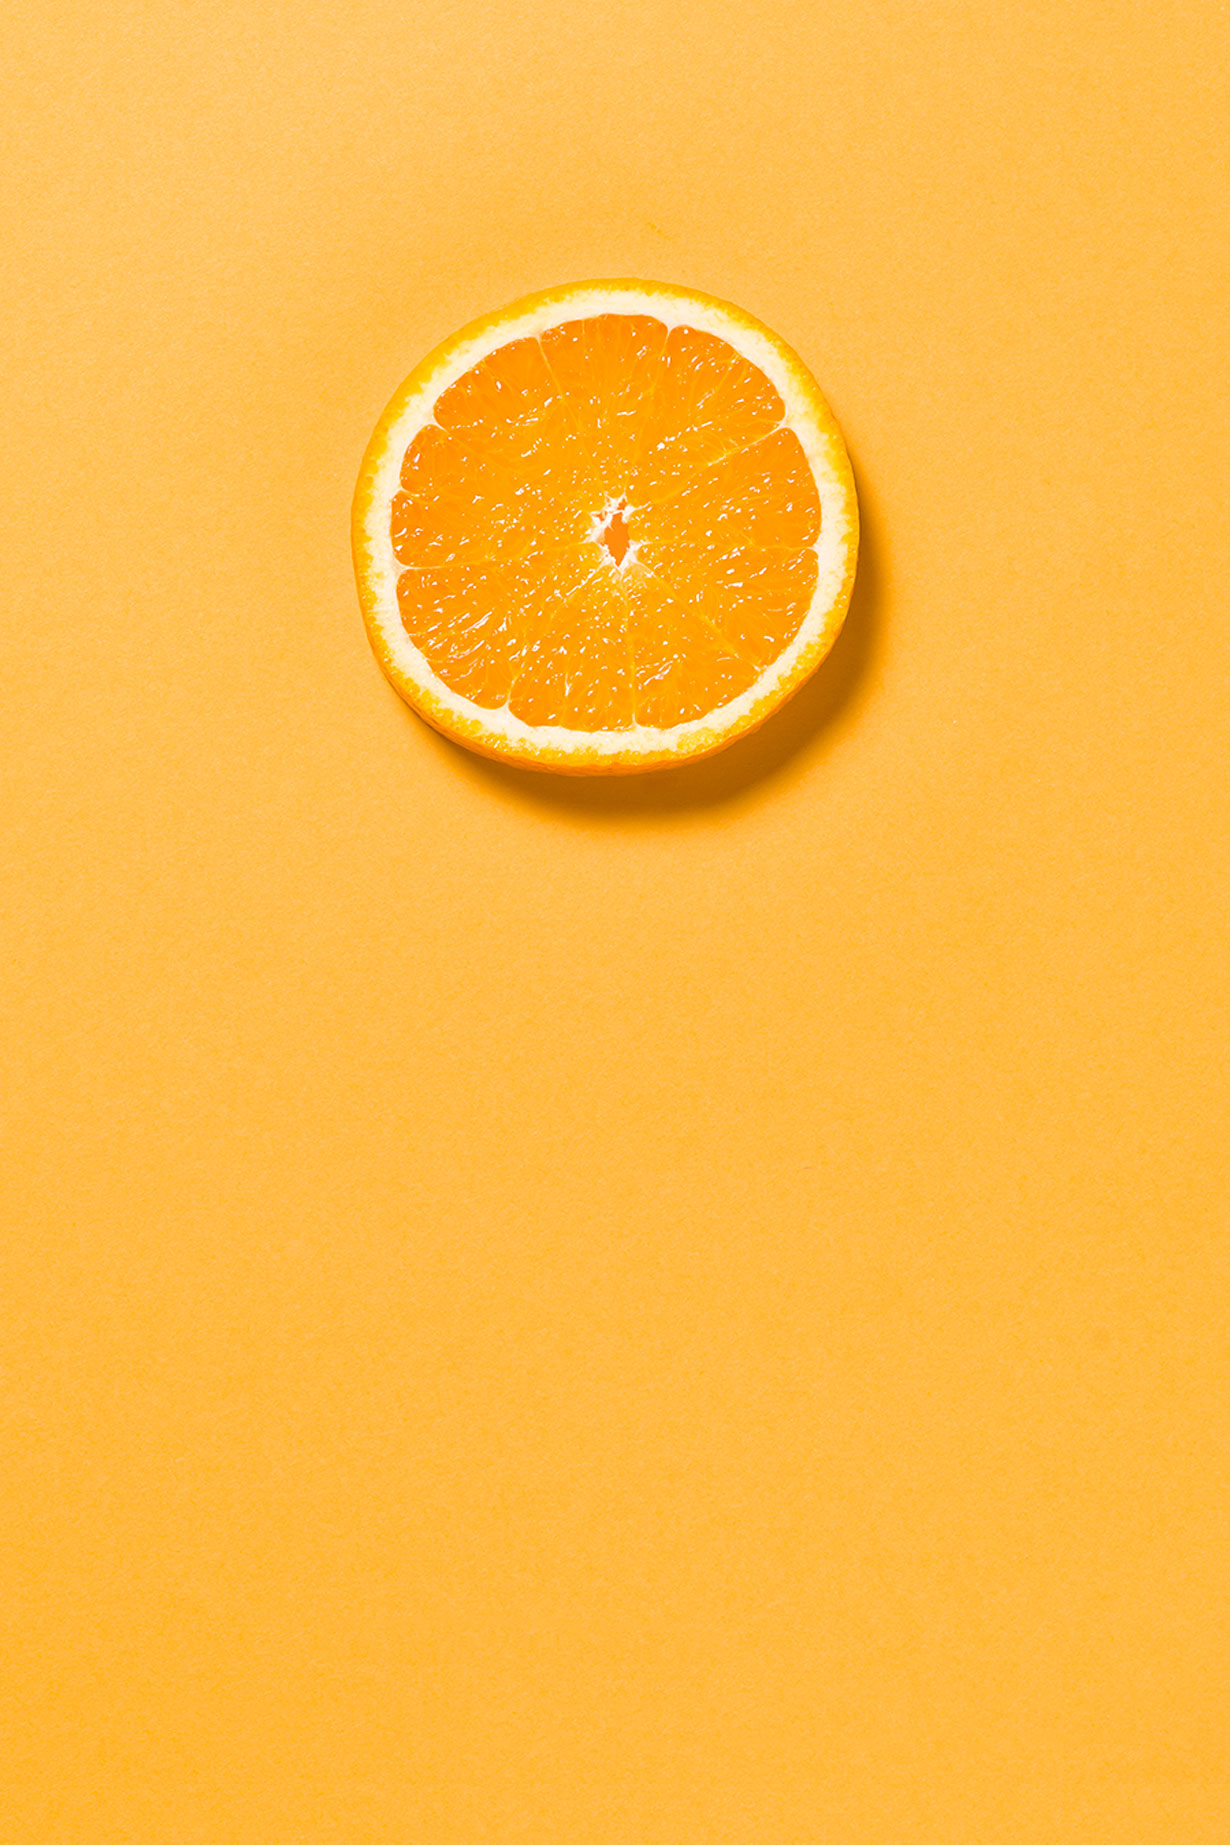 frutta fresca e acidula